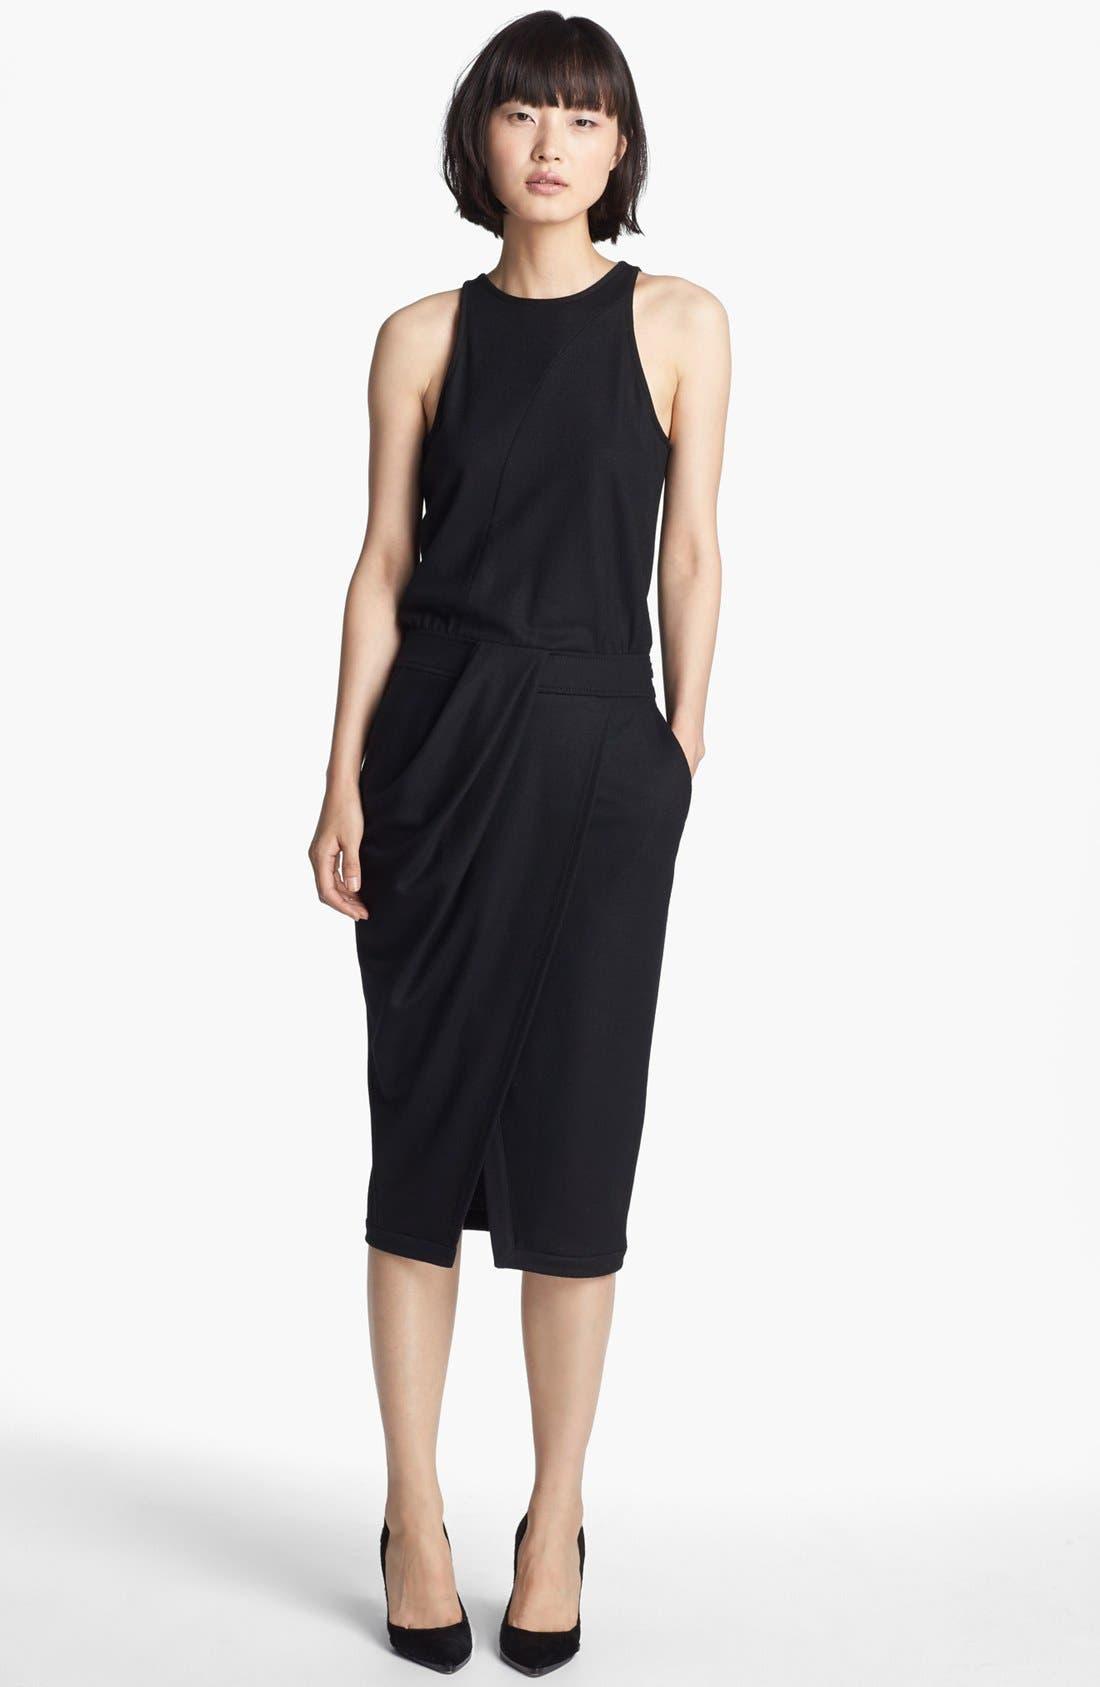 Alternate Image 1 Selected - Helmut Lang 'Sonar Wool' Drape Front Dress